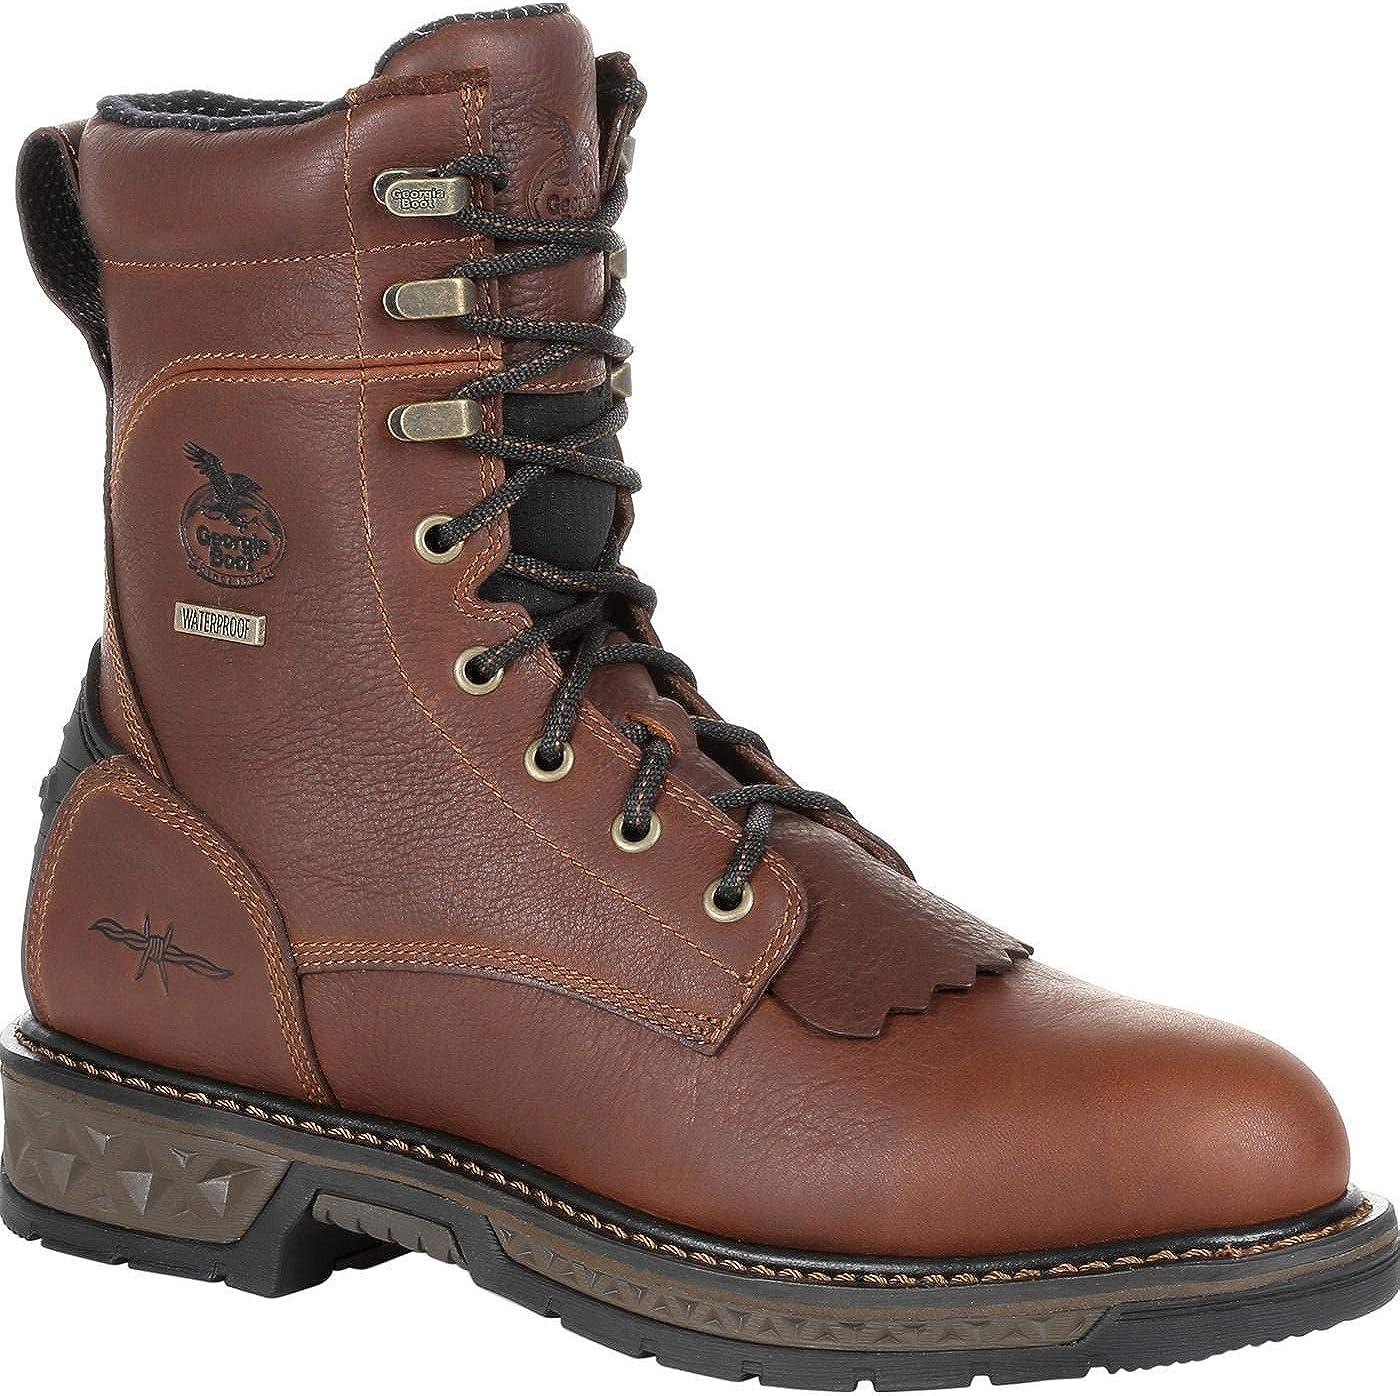 Georgia Special sale item Men's Boot Carbo-Tec Lt Waterproof Today's only Toe Brown Steel Work